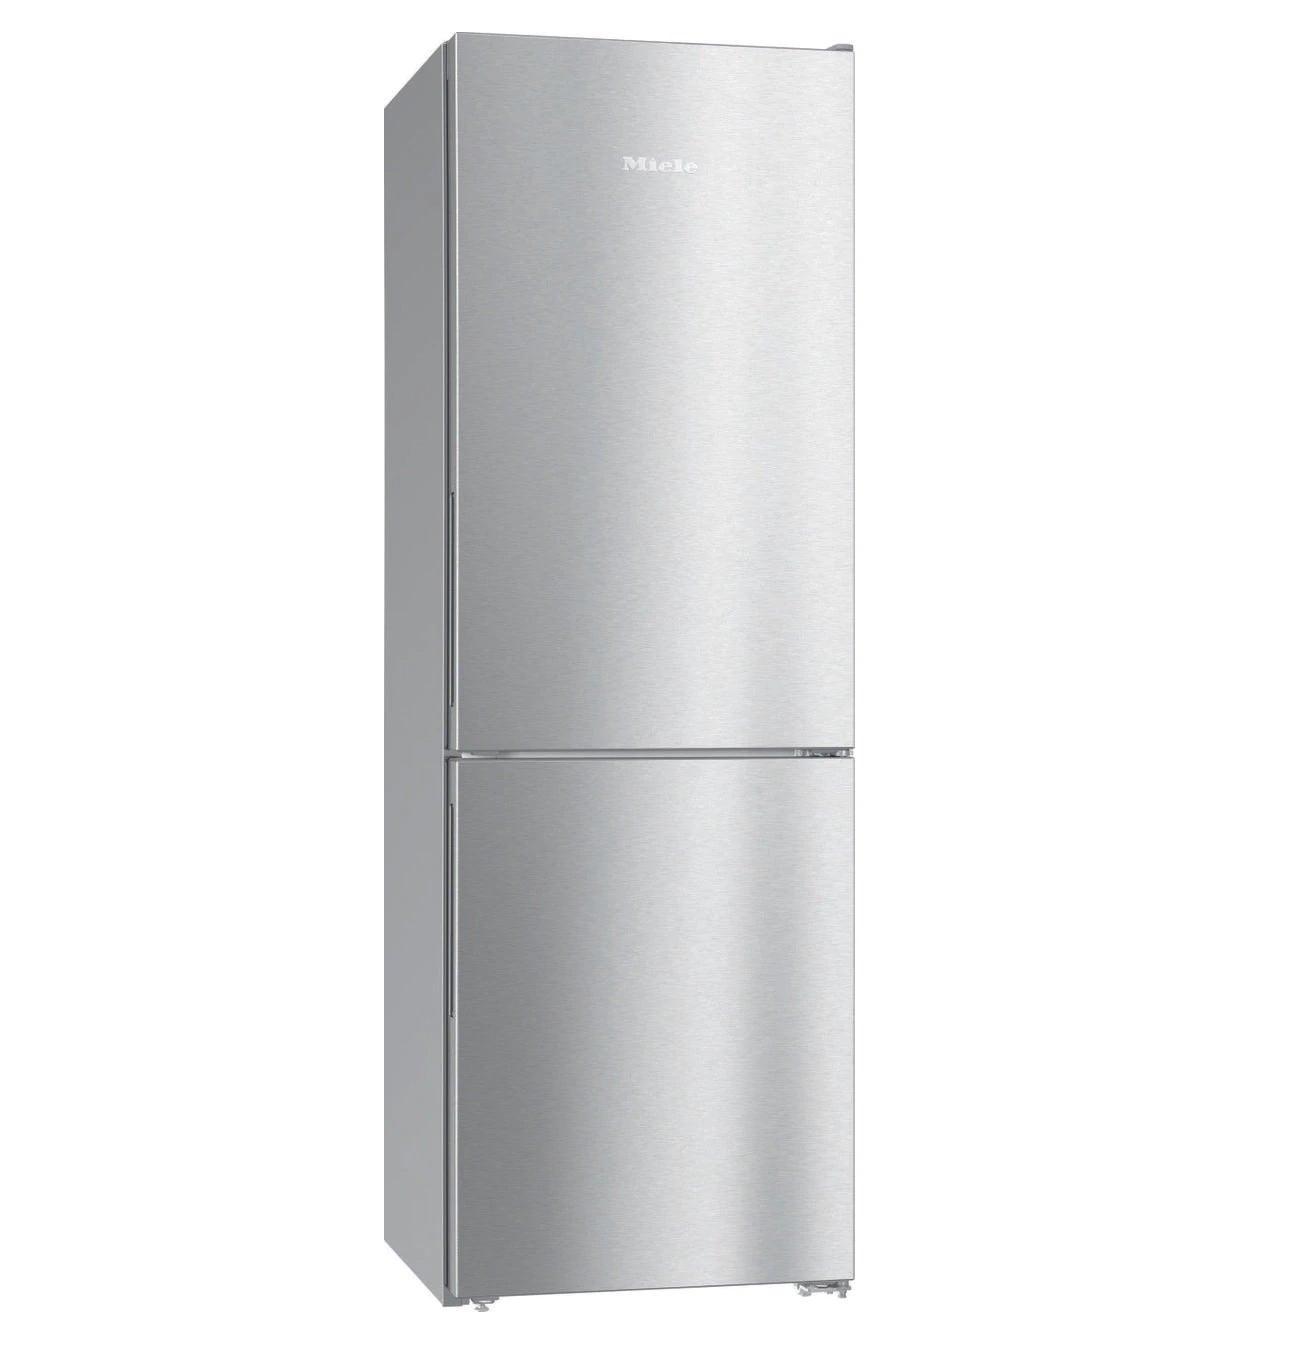 Miele KFN28032 Refrigerator